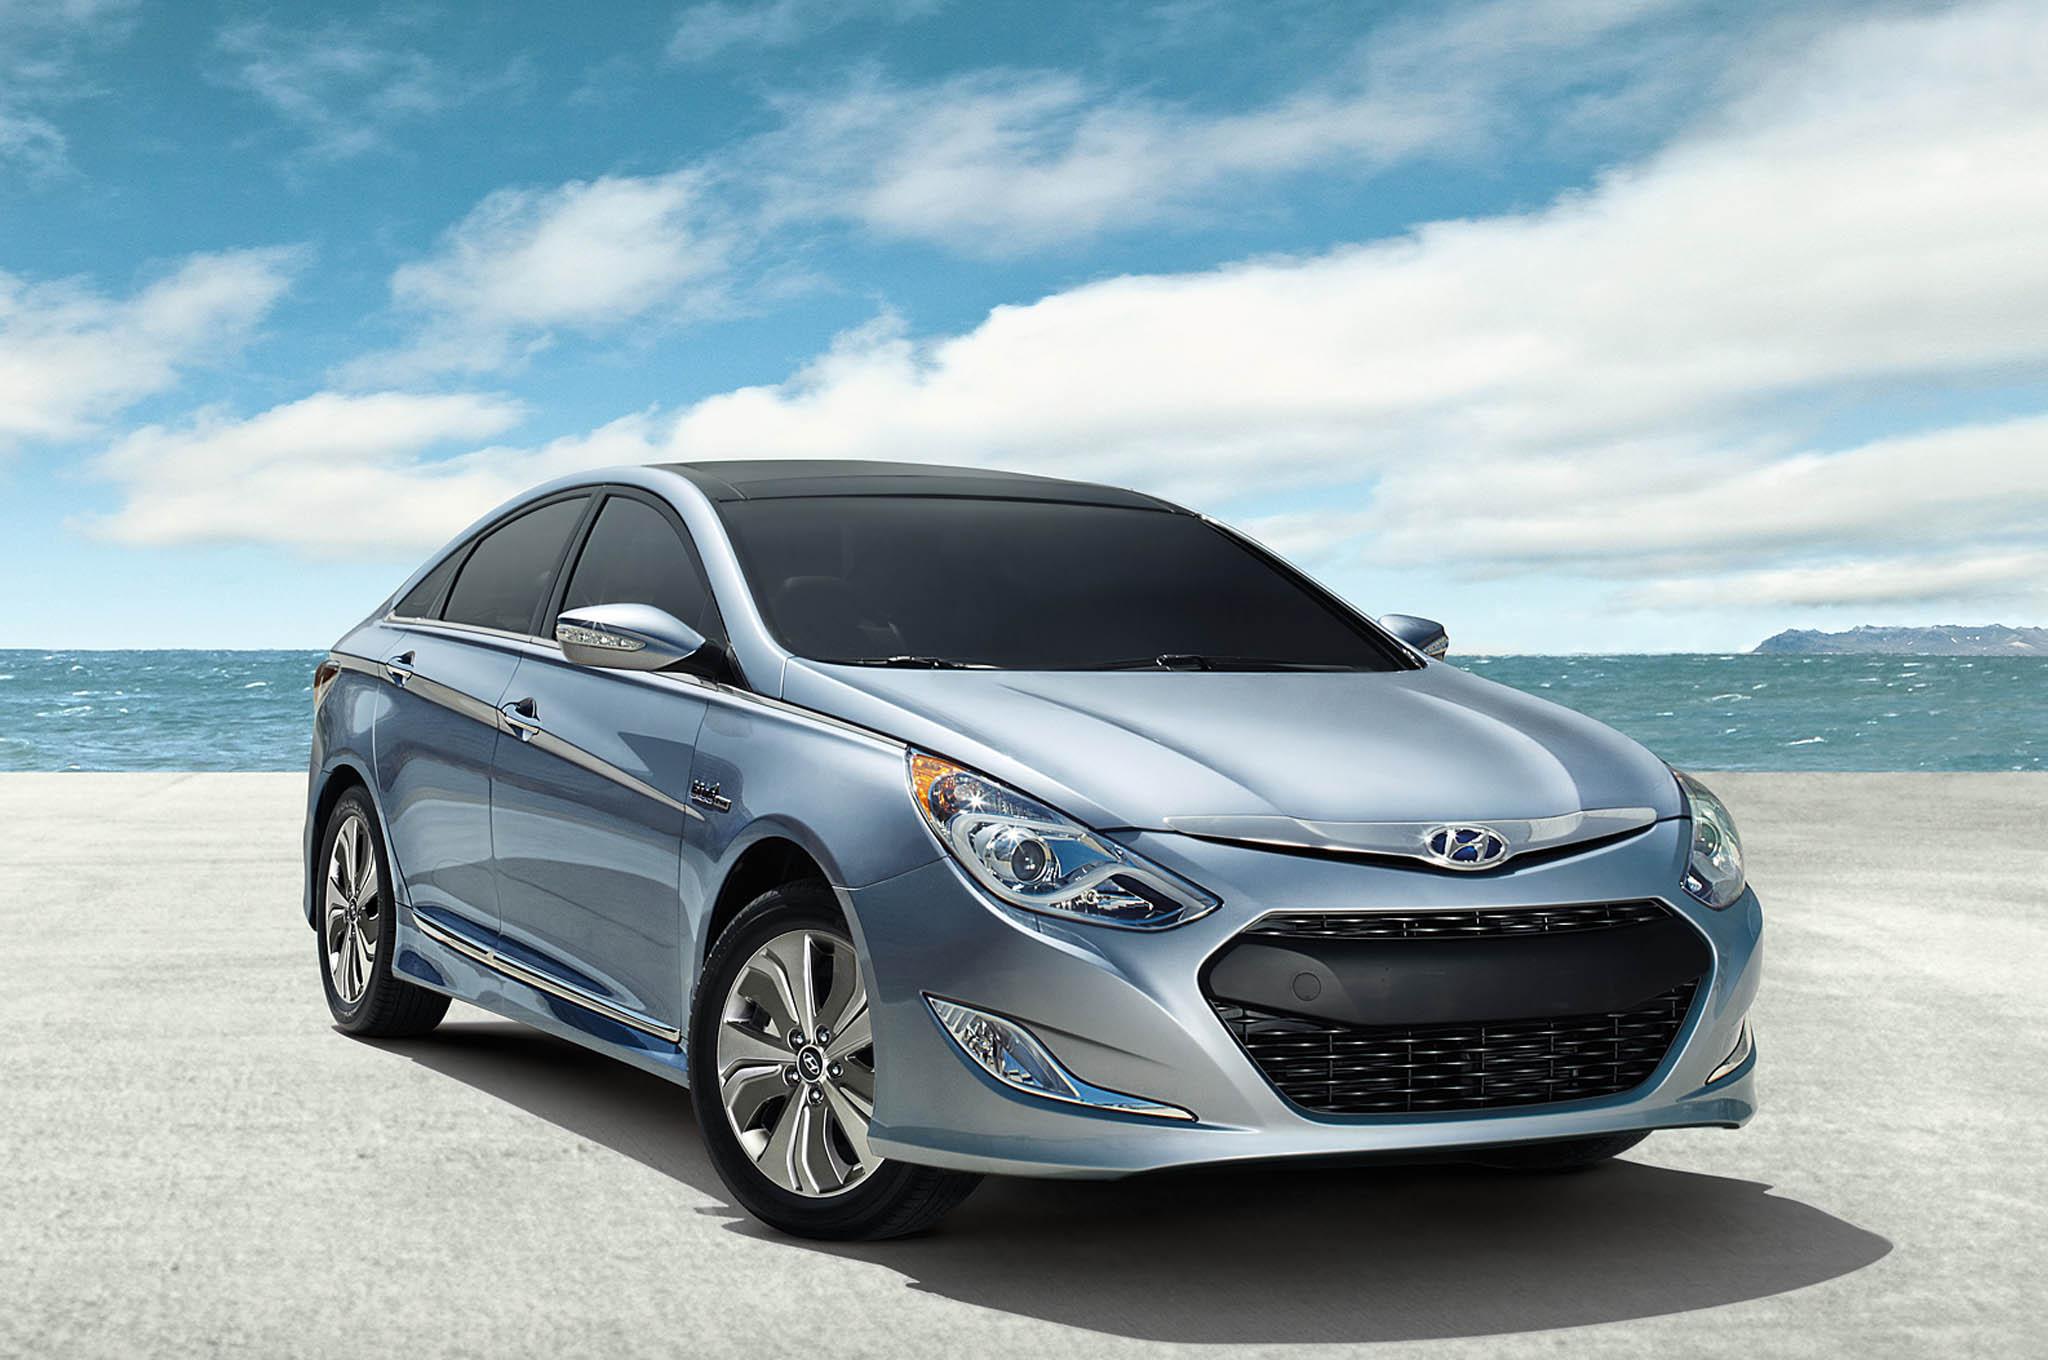 2014 Hyundai Sonata Hybrid Priced at $26,810 - Automobile Magazine